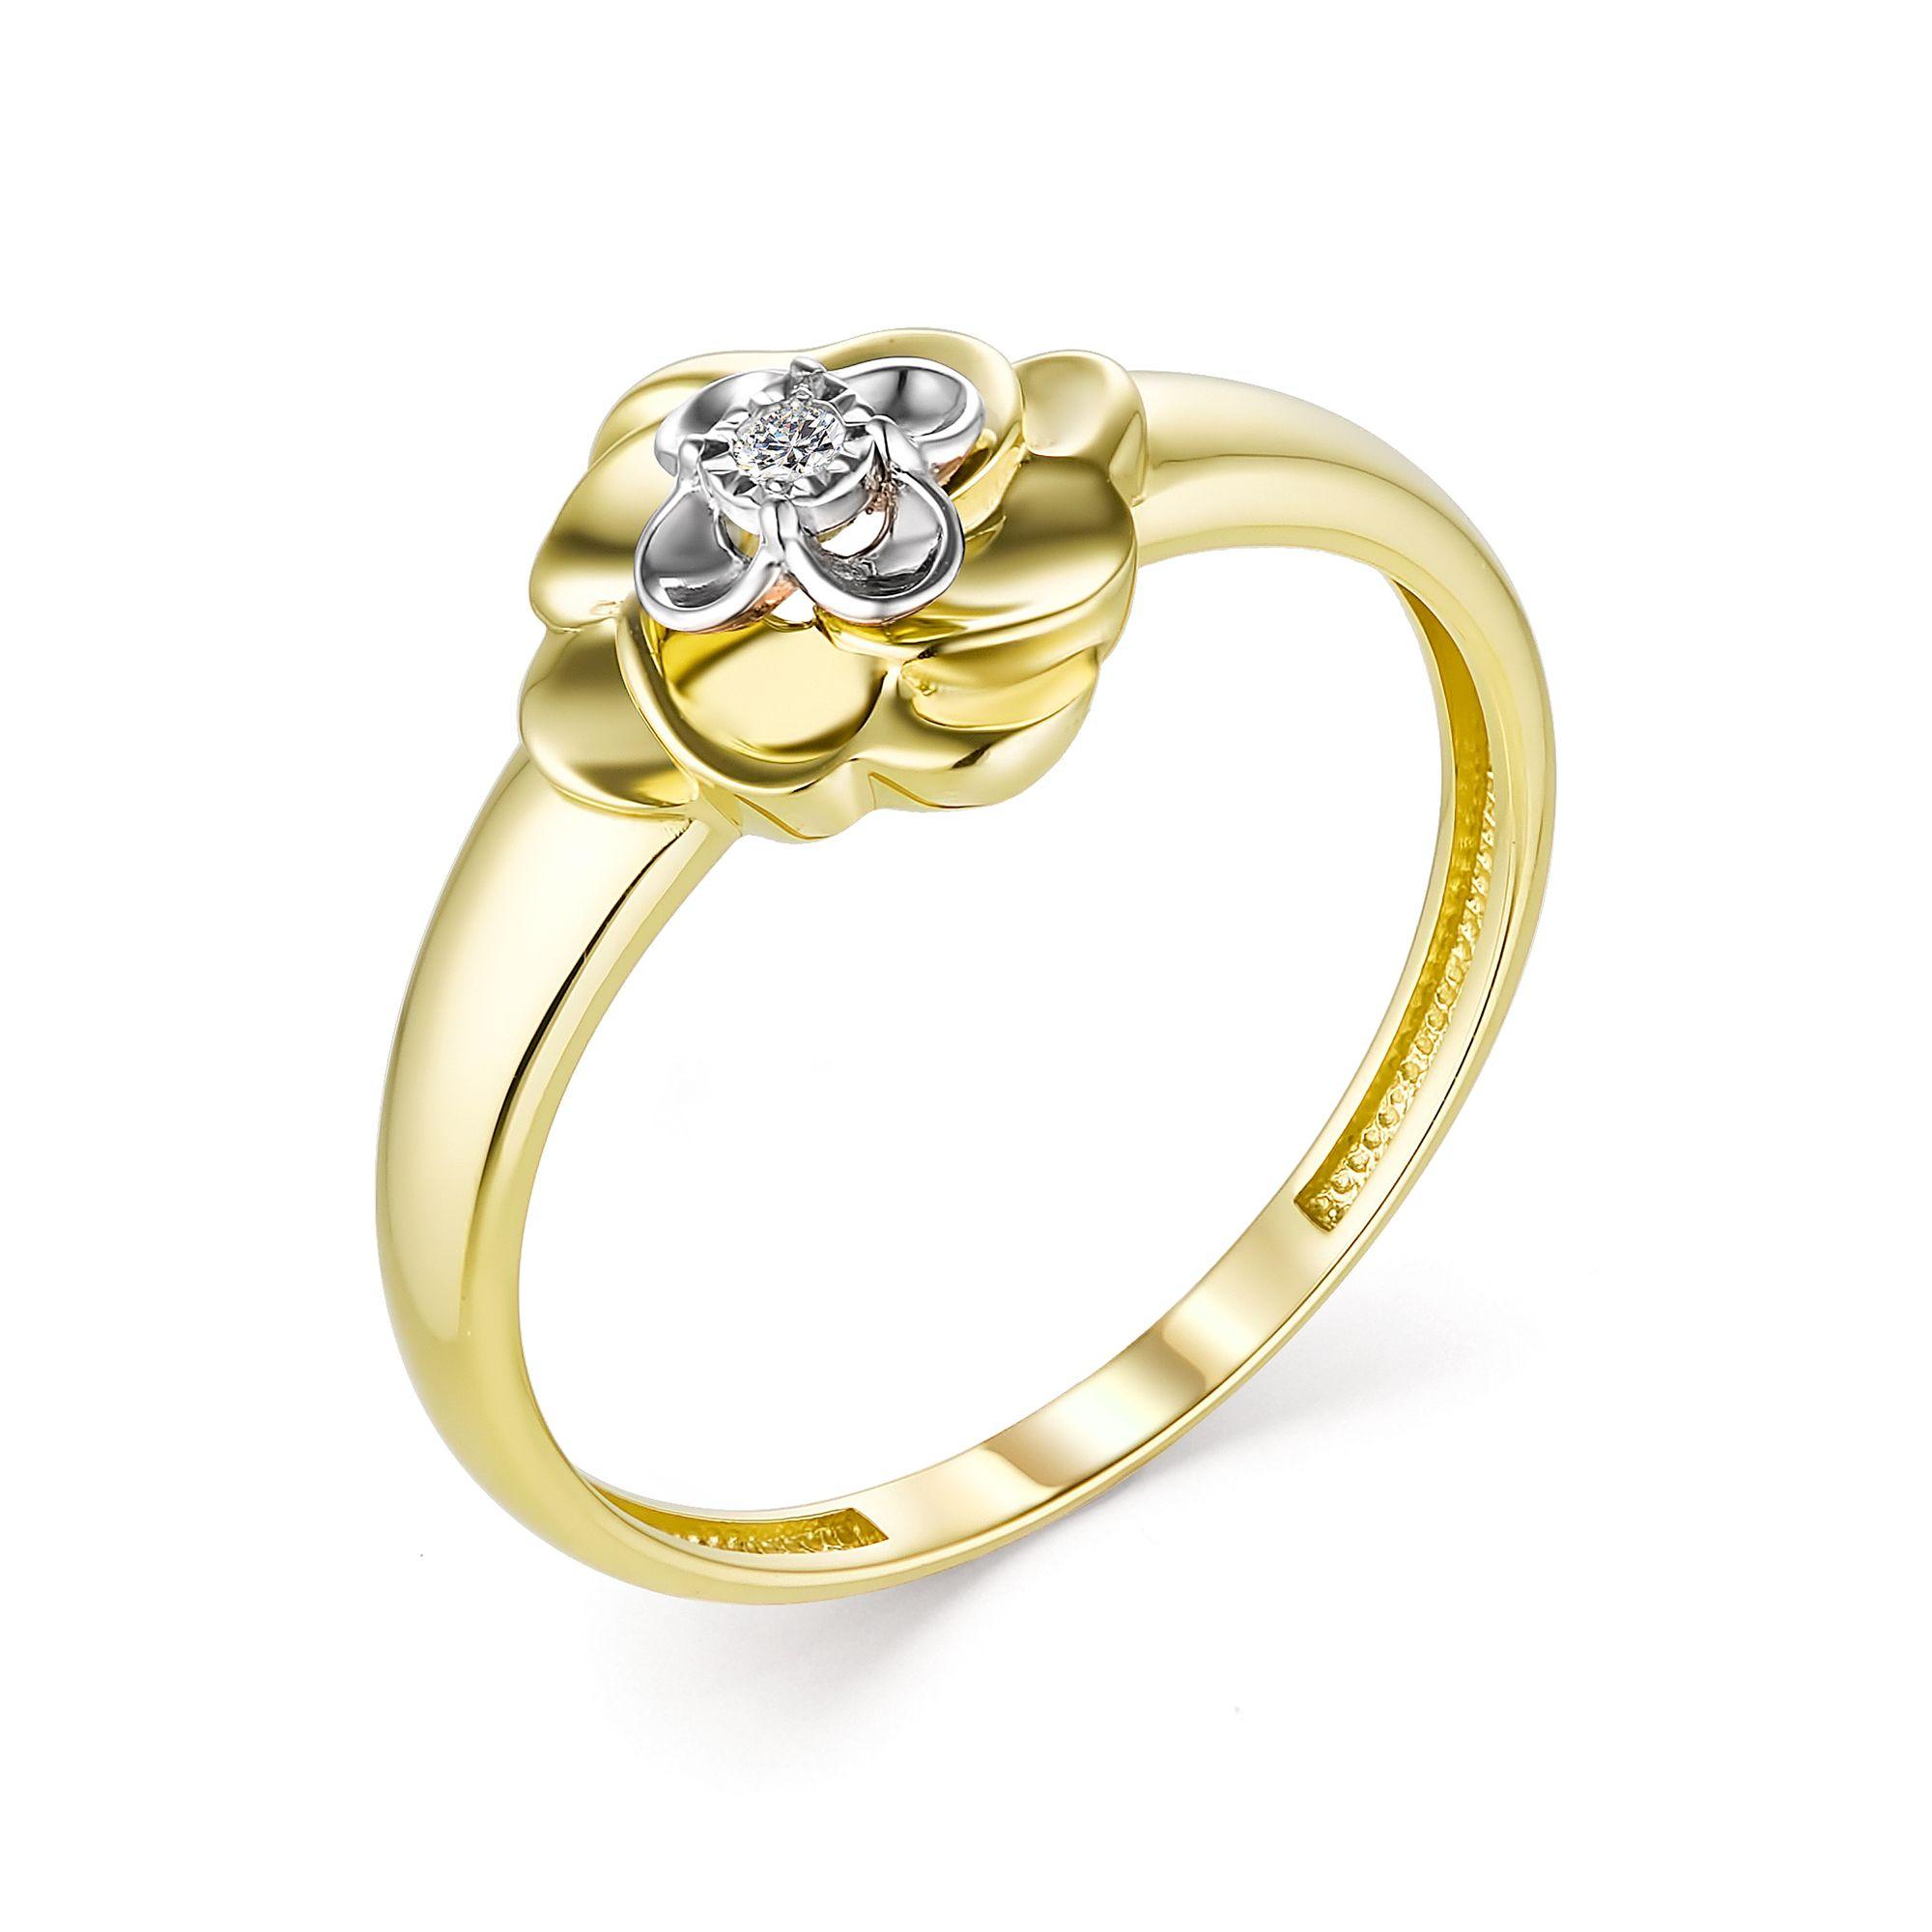 картинка кольцо 13283-300 1 бриллиант круг 57 0,016 60-90 4/5а 13283-300